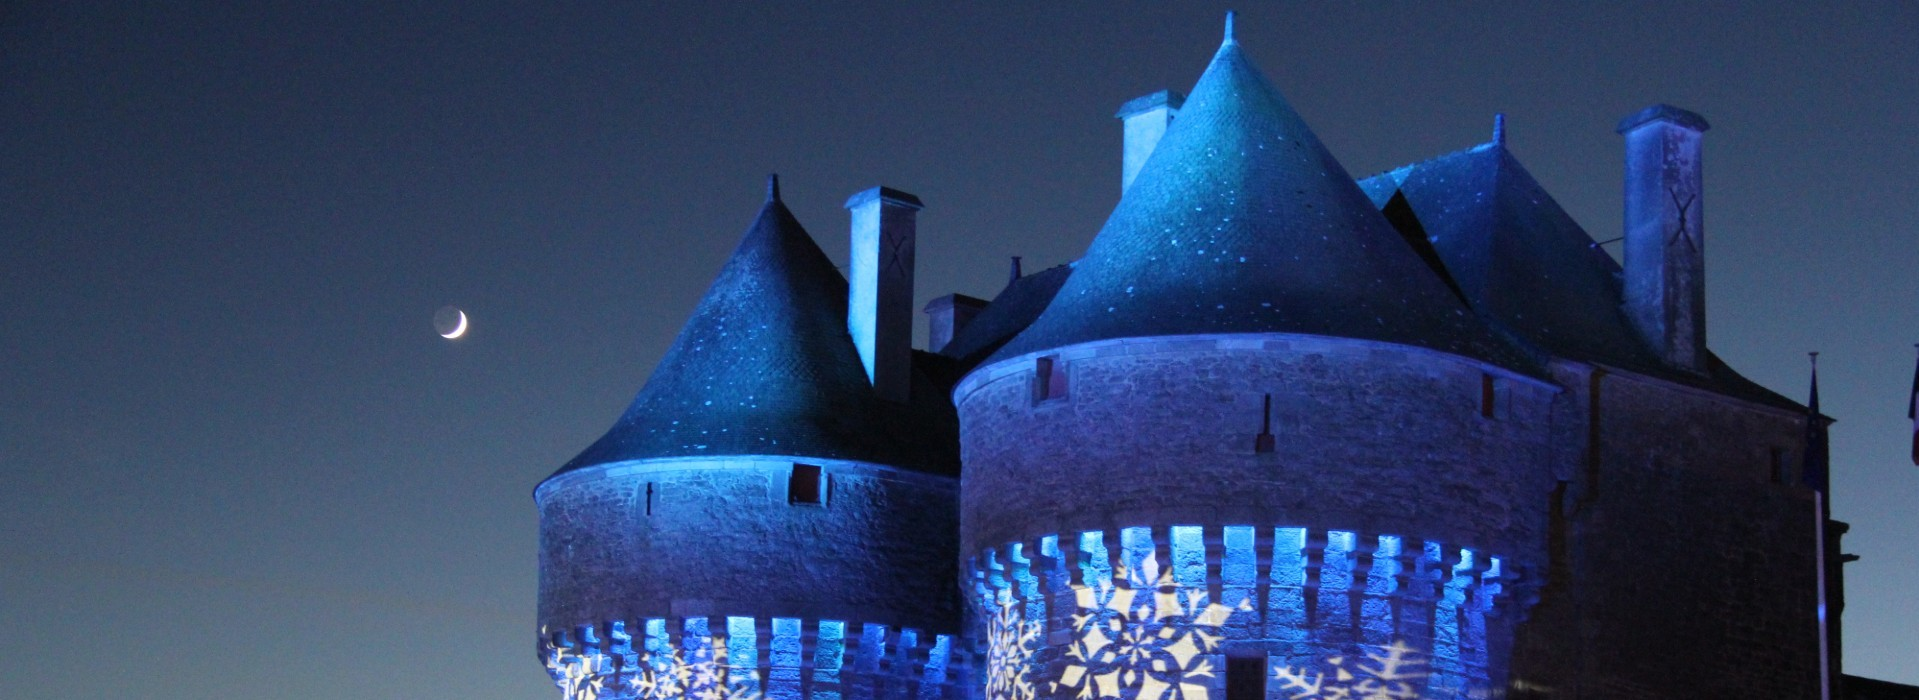 Guérande by light thème Noël 2018 - Mairie de Guérande